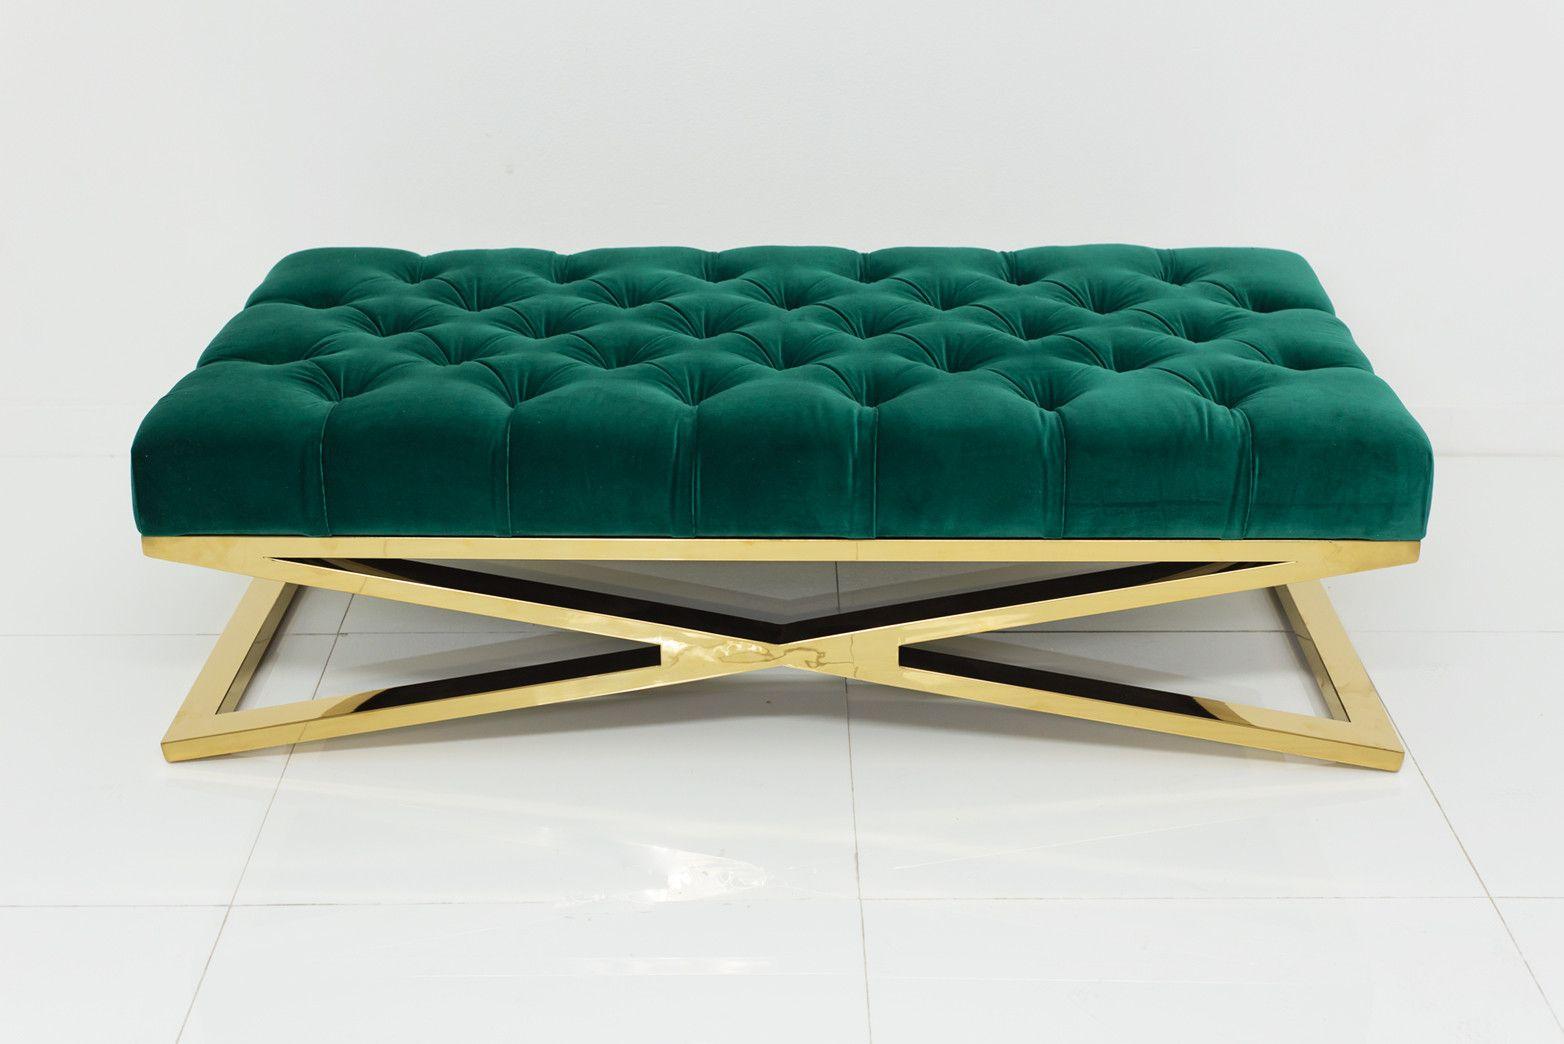 Brass X-base Ottoman In Regal Laguna Velvet Green With